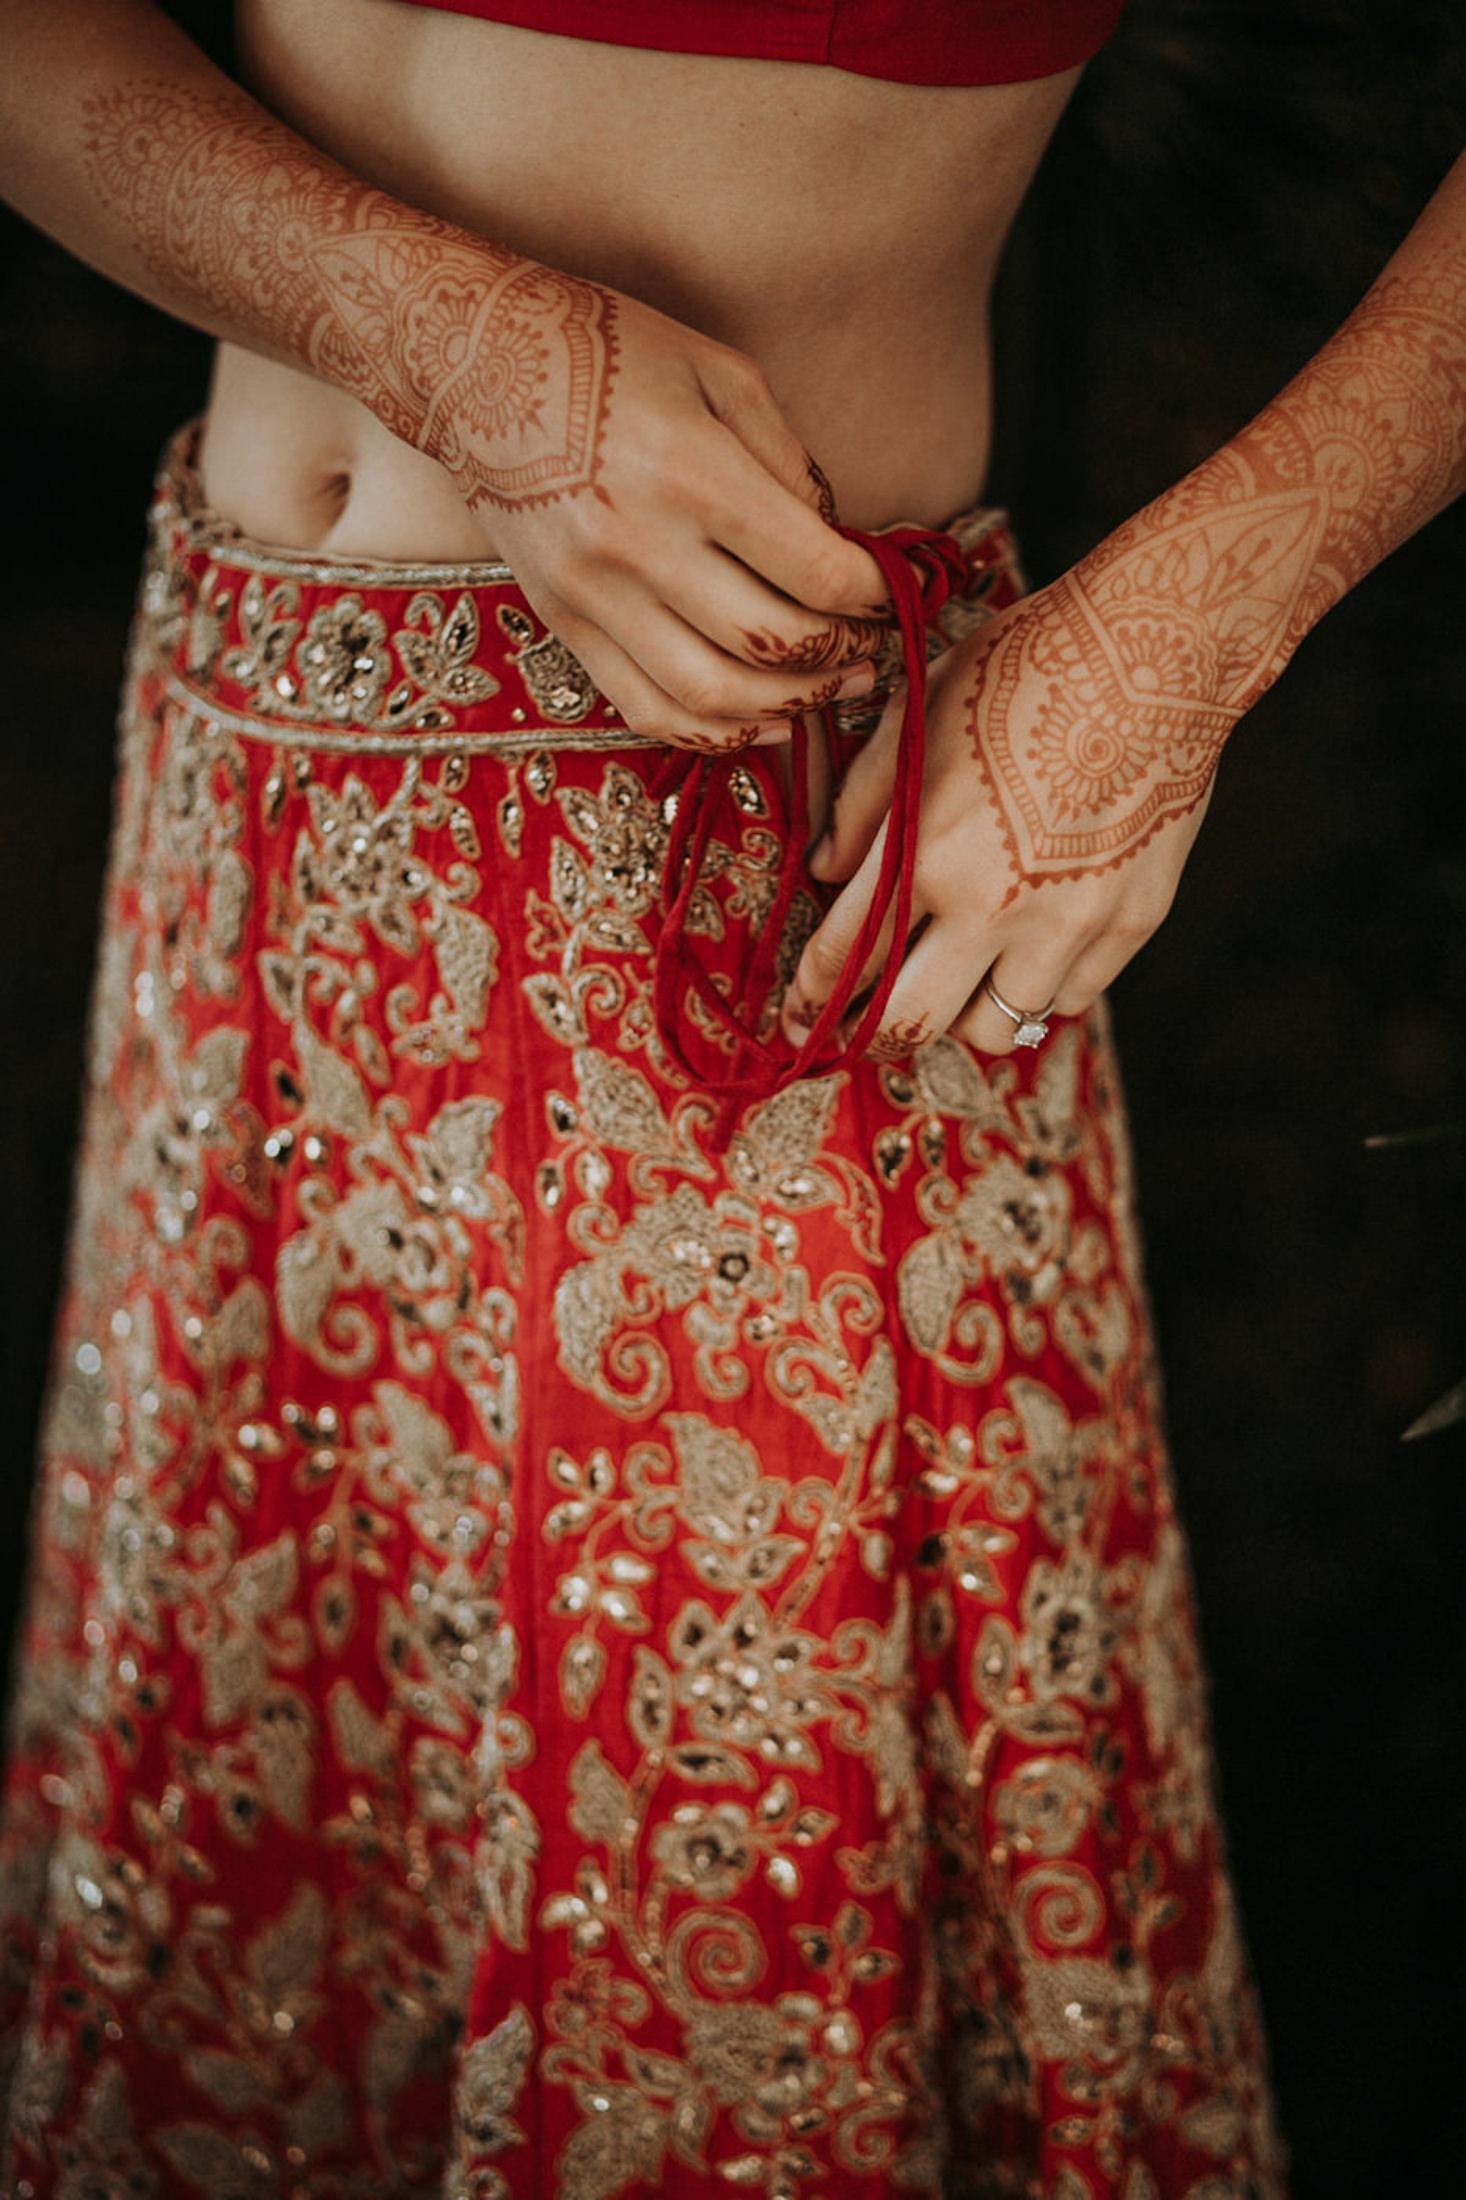 Wedding_Photographer_Mallorca_Daniela-Marquardt_Photography_New_York_Iceland_Tuscany_Santorini_Portugal_Austria_Bavaria_Elopement_Hochzeitsfotograf_AntjeRajat2_10